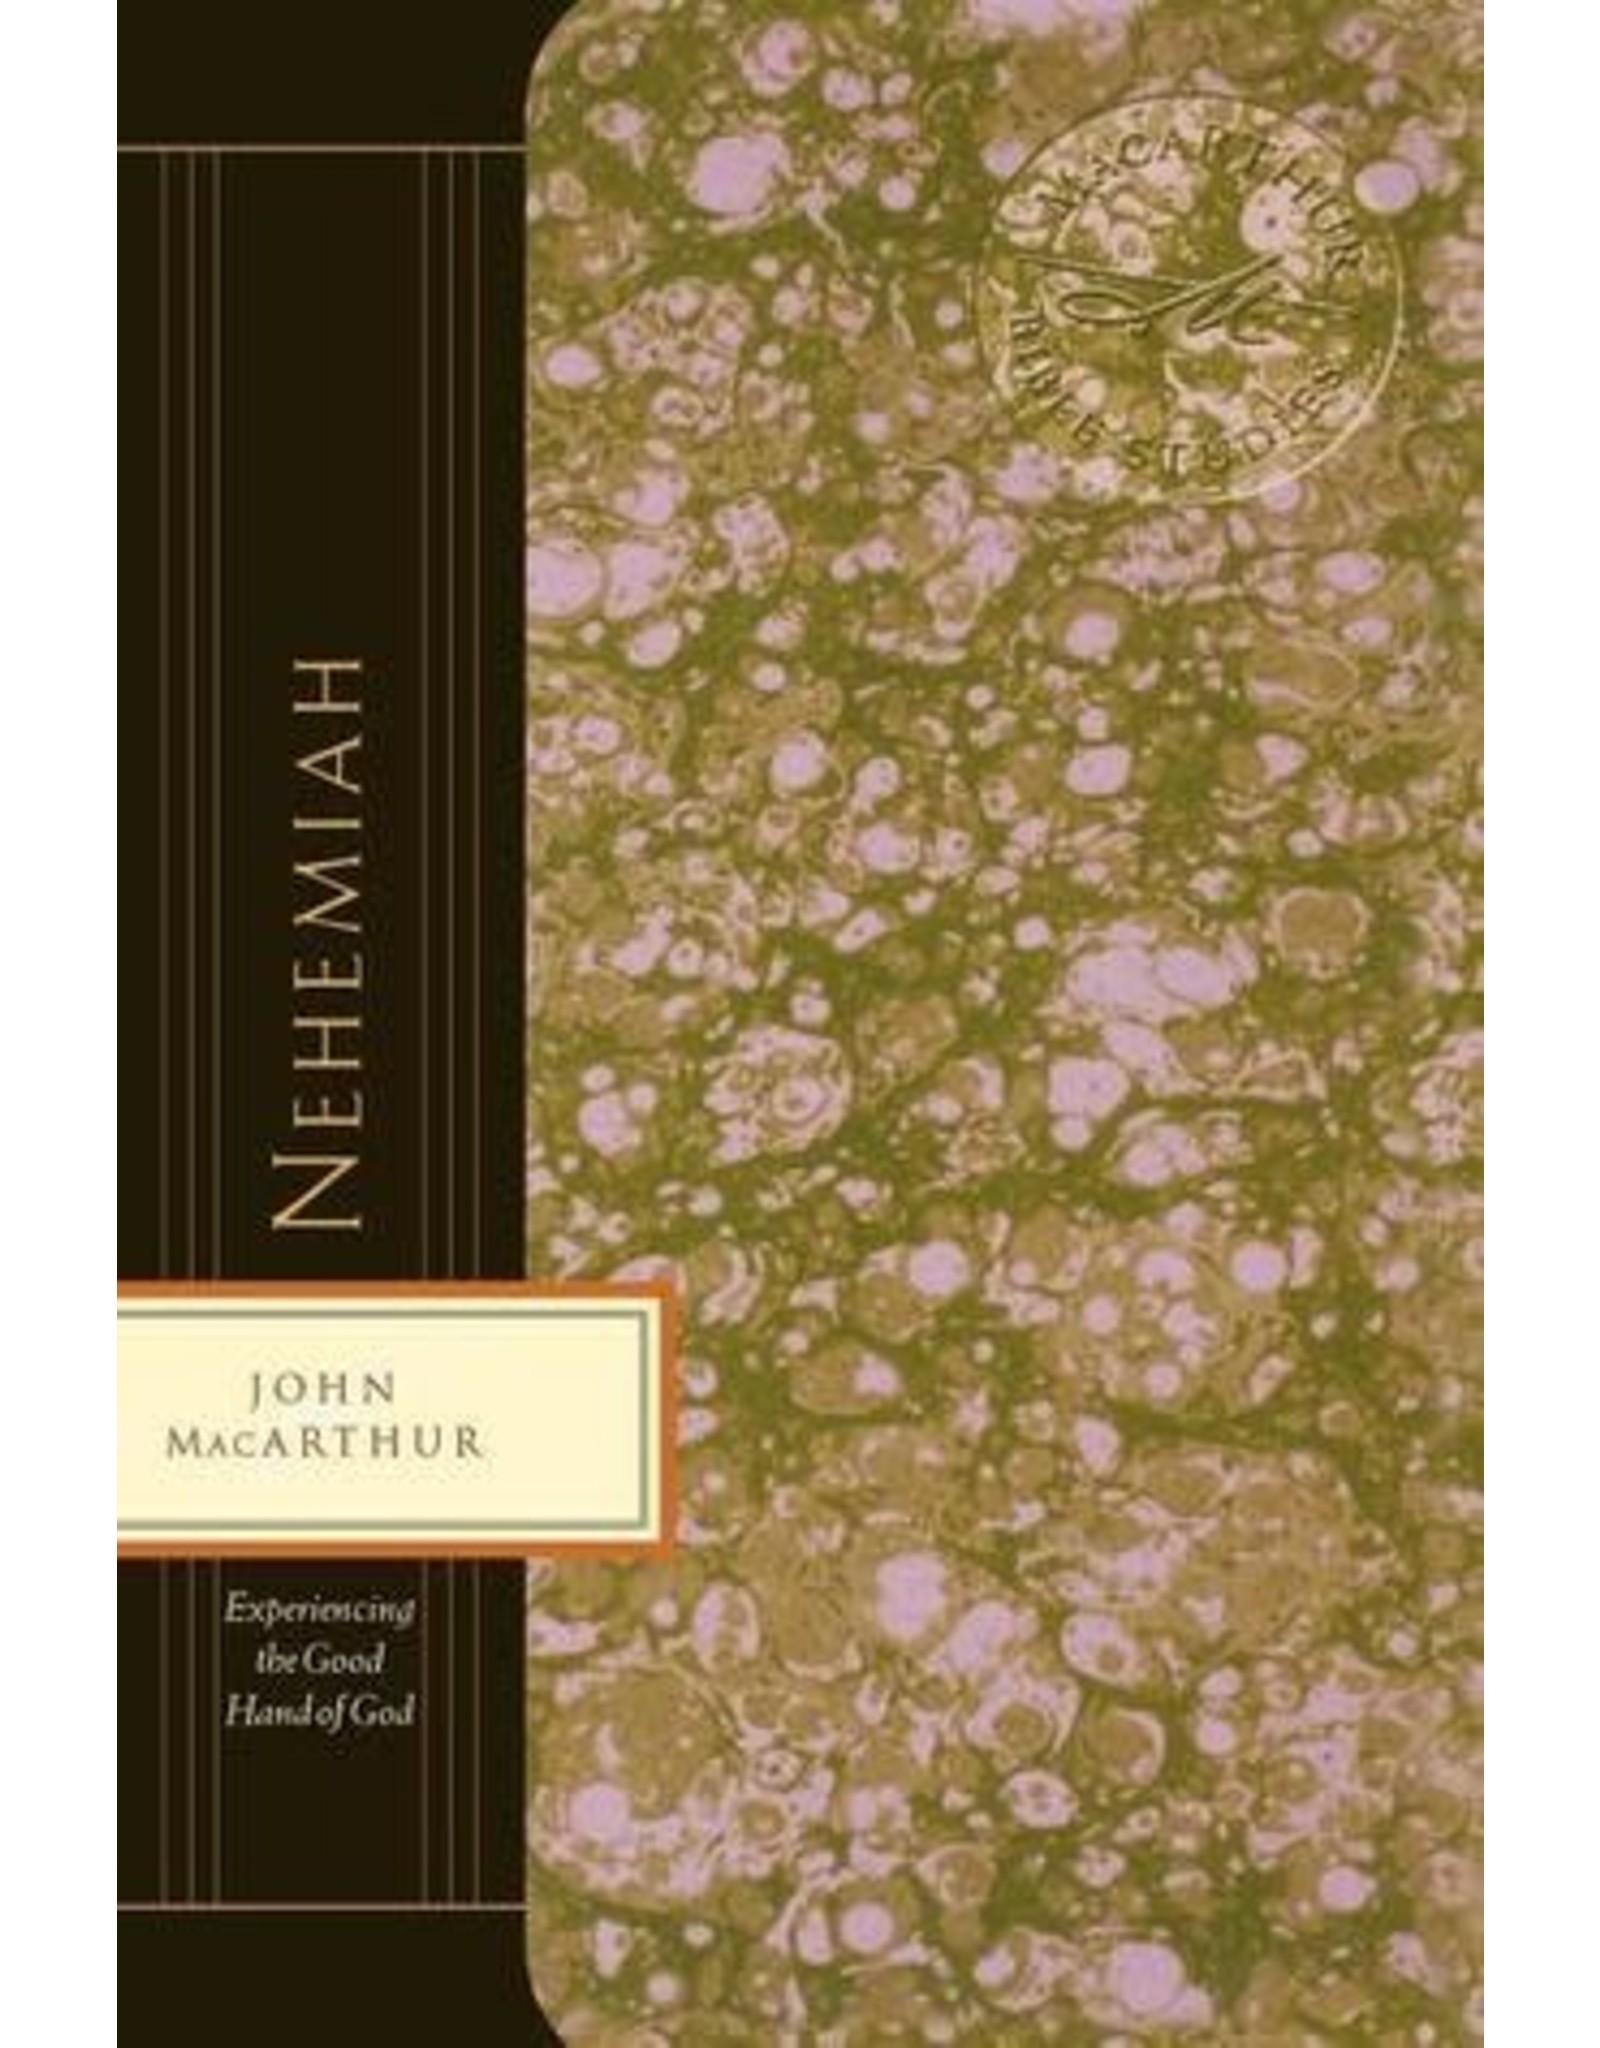 MacArthur Nehemiah: Experiencing the good hand of God (John MacArthur Bible study)